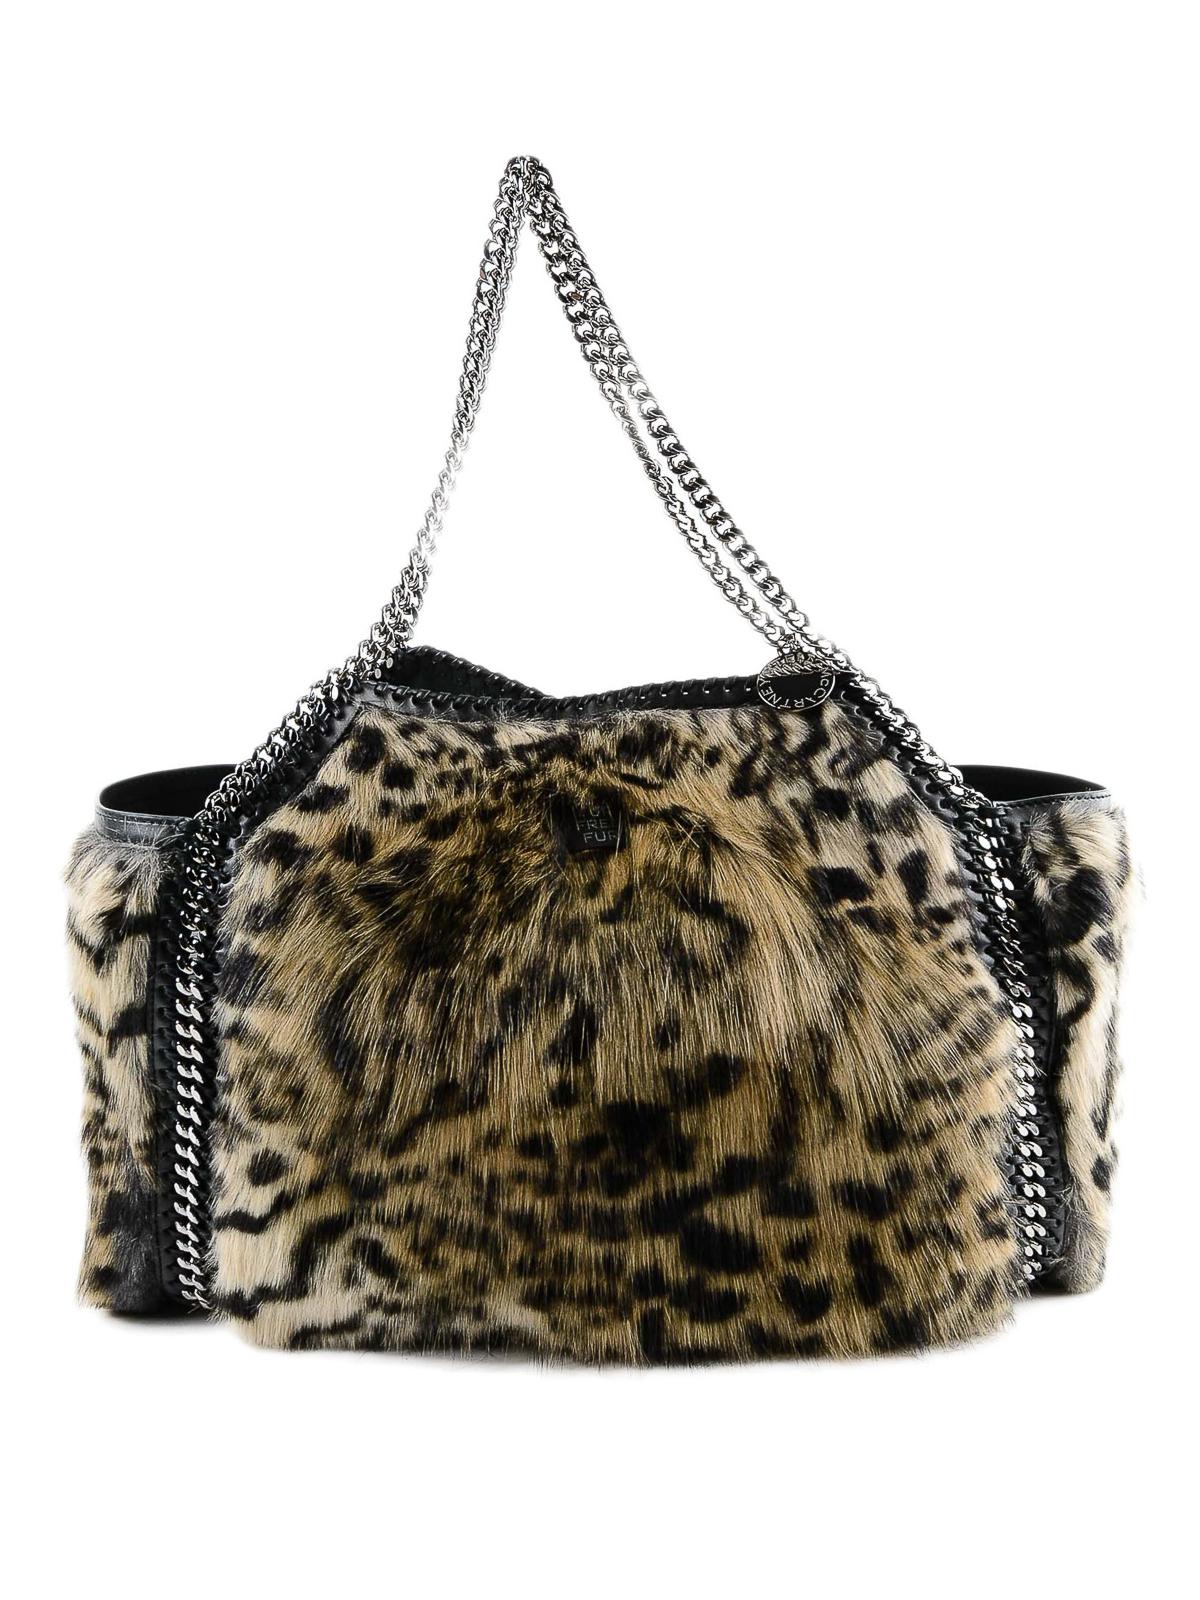 8bff516e5b Stella Mccartney - Falabella faux fur tote - totes bags ...